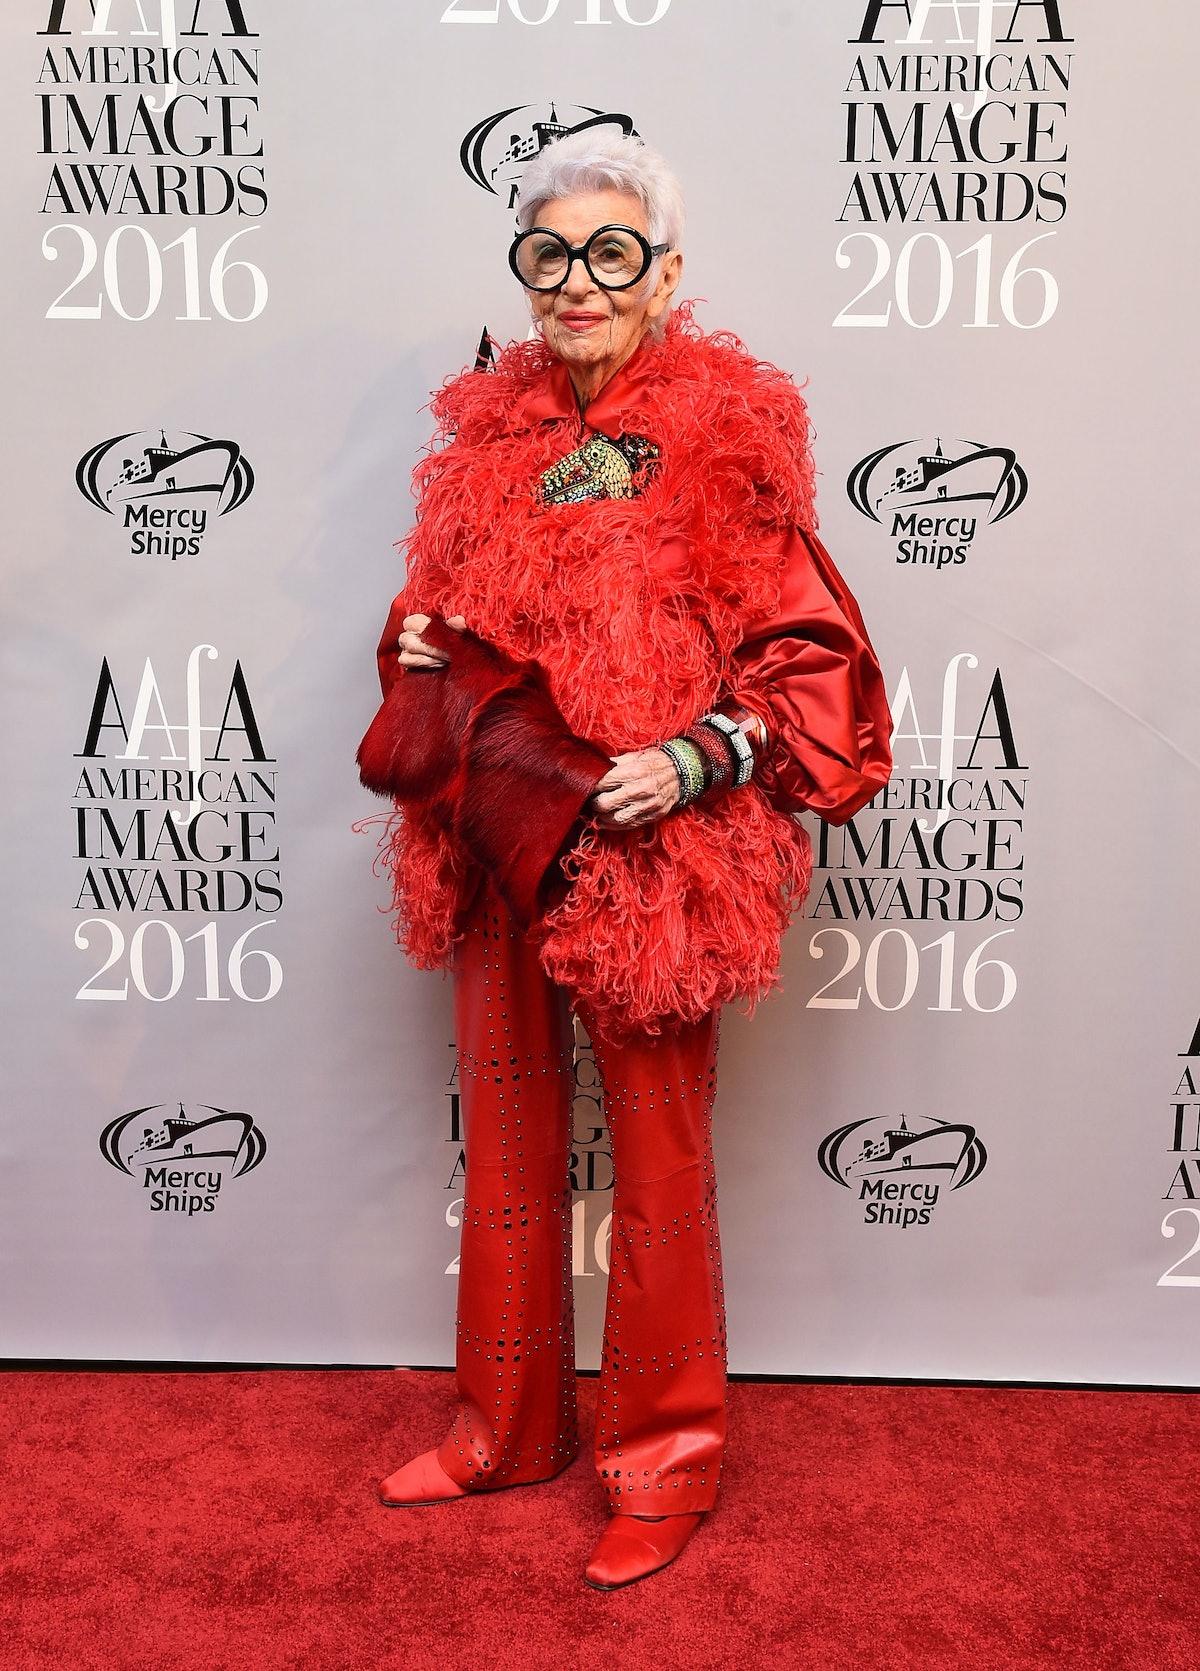 American Apparel & Footwear Association's 38th Annual American Image Awards 2016